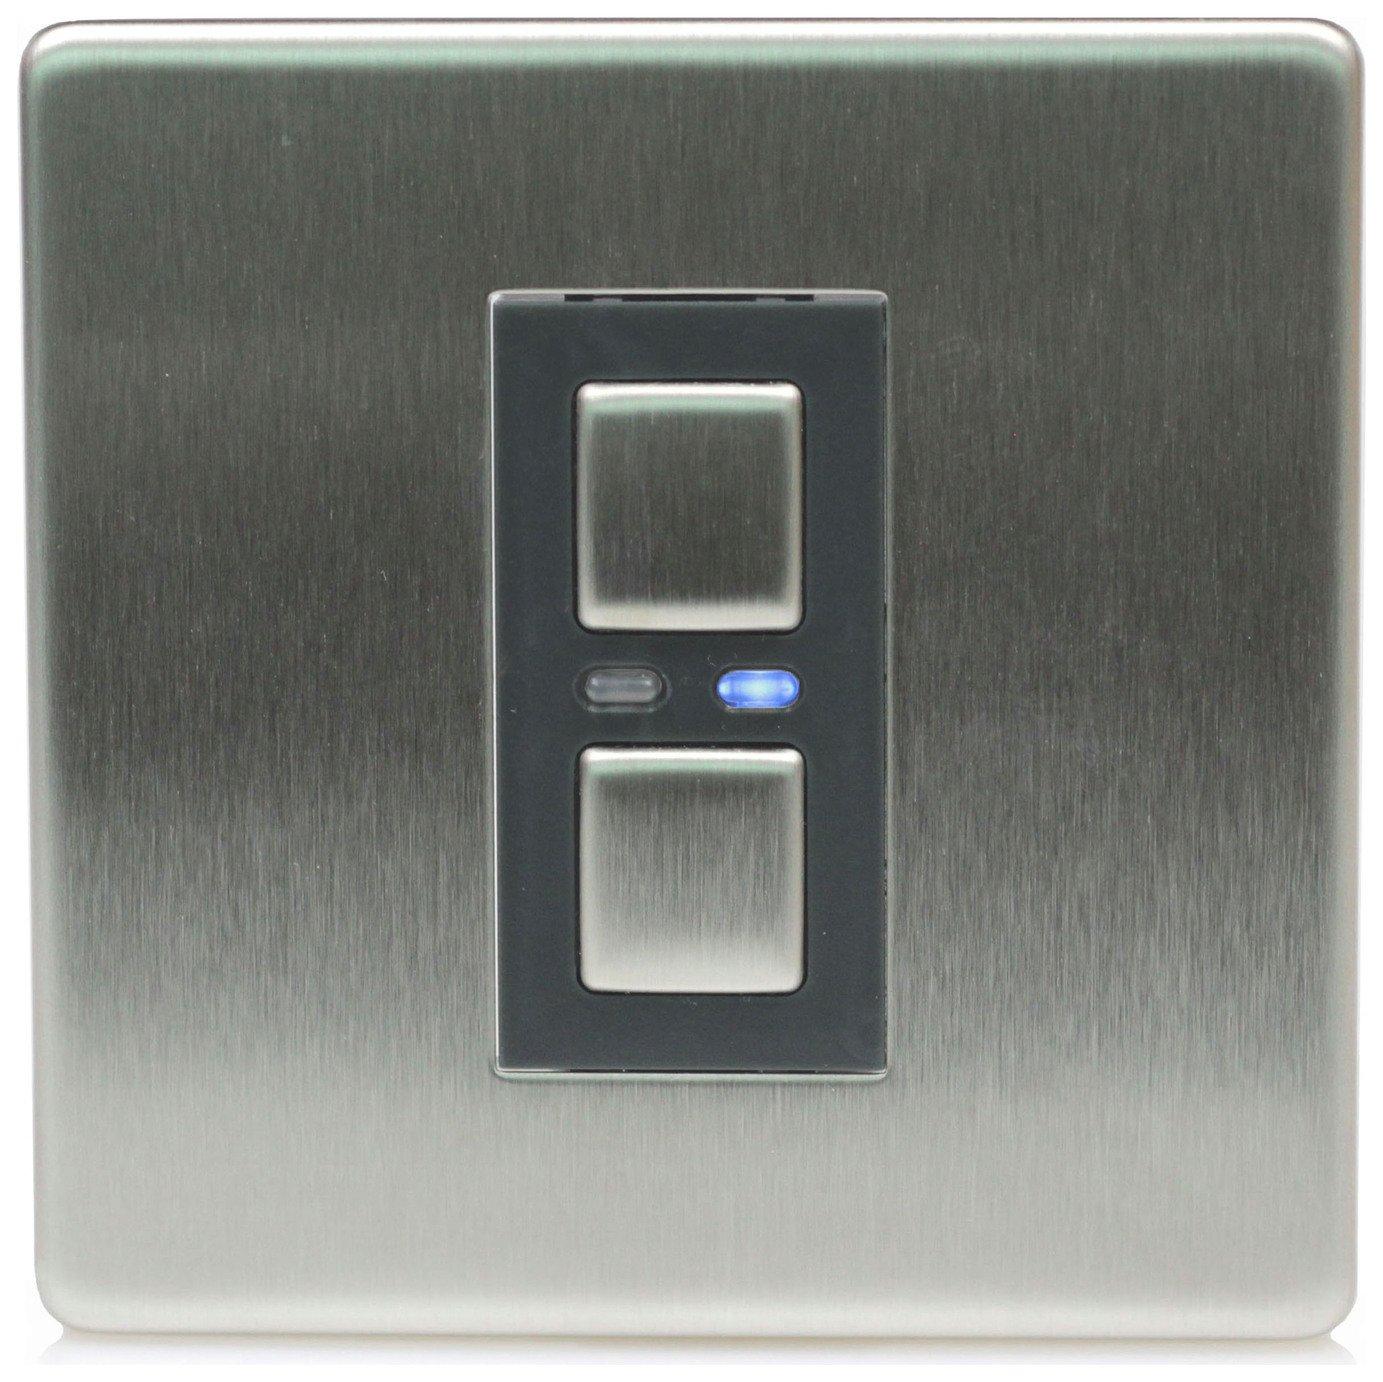 Lightwave RF 1 Gang Dimmer Switch - Stainless Steel